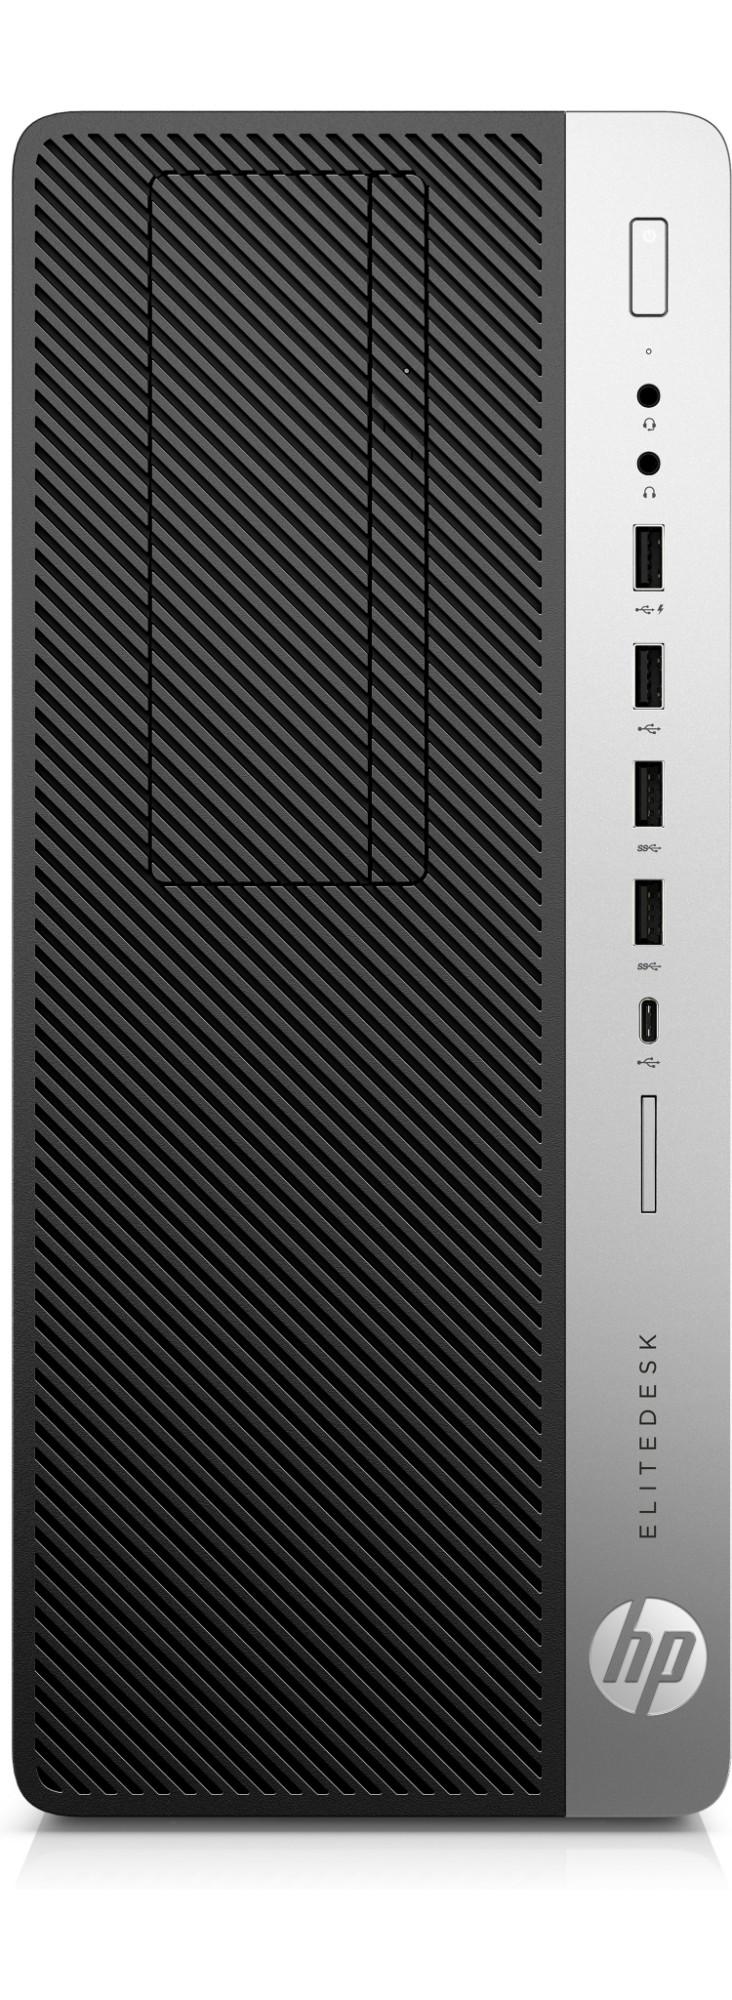 HP EliteDesk 800 G3 3.6GHz i7-7700 Tower Black, Silver PC